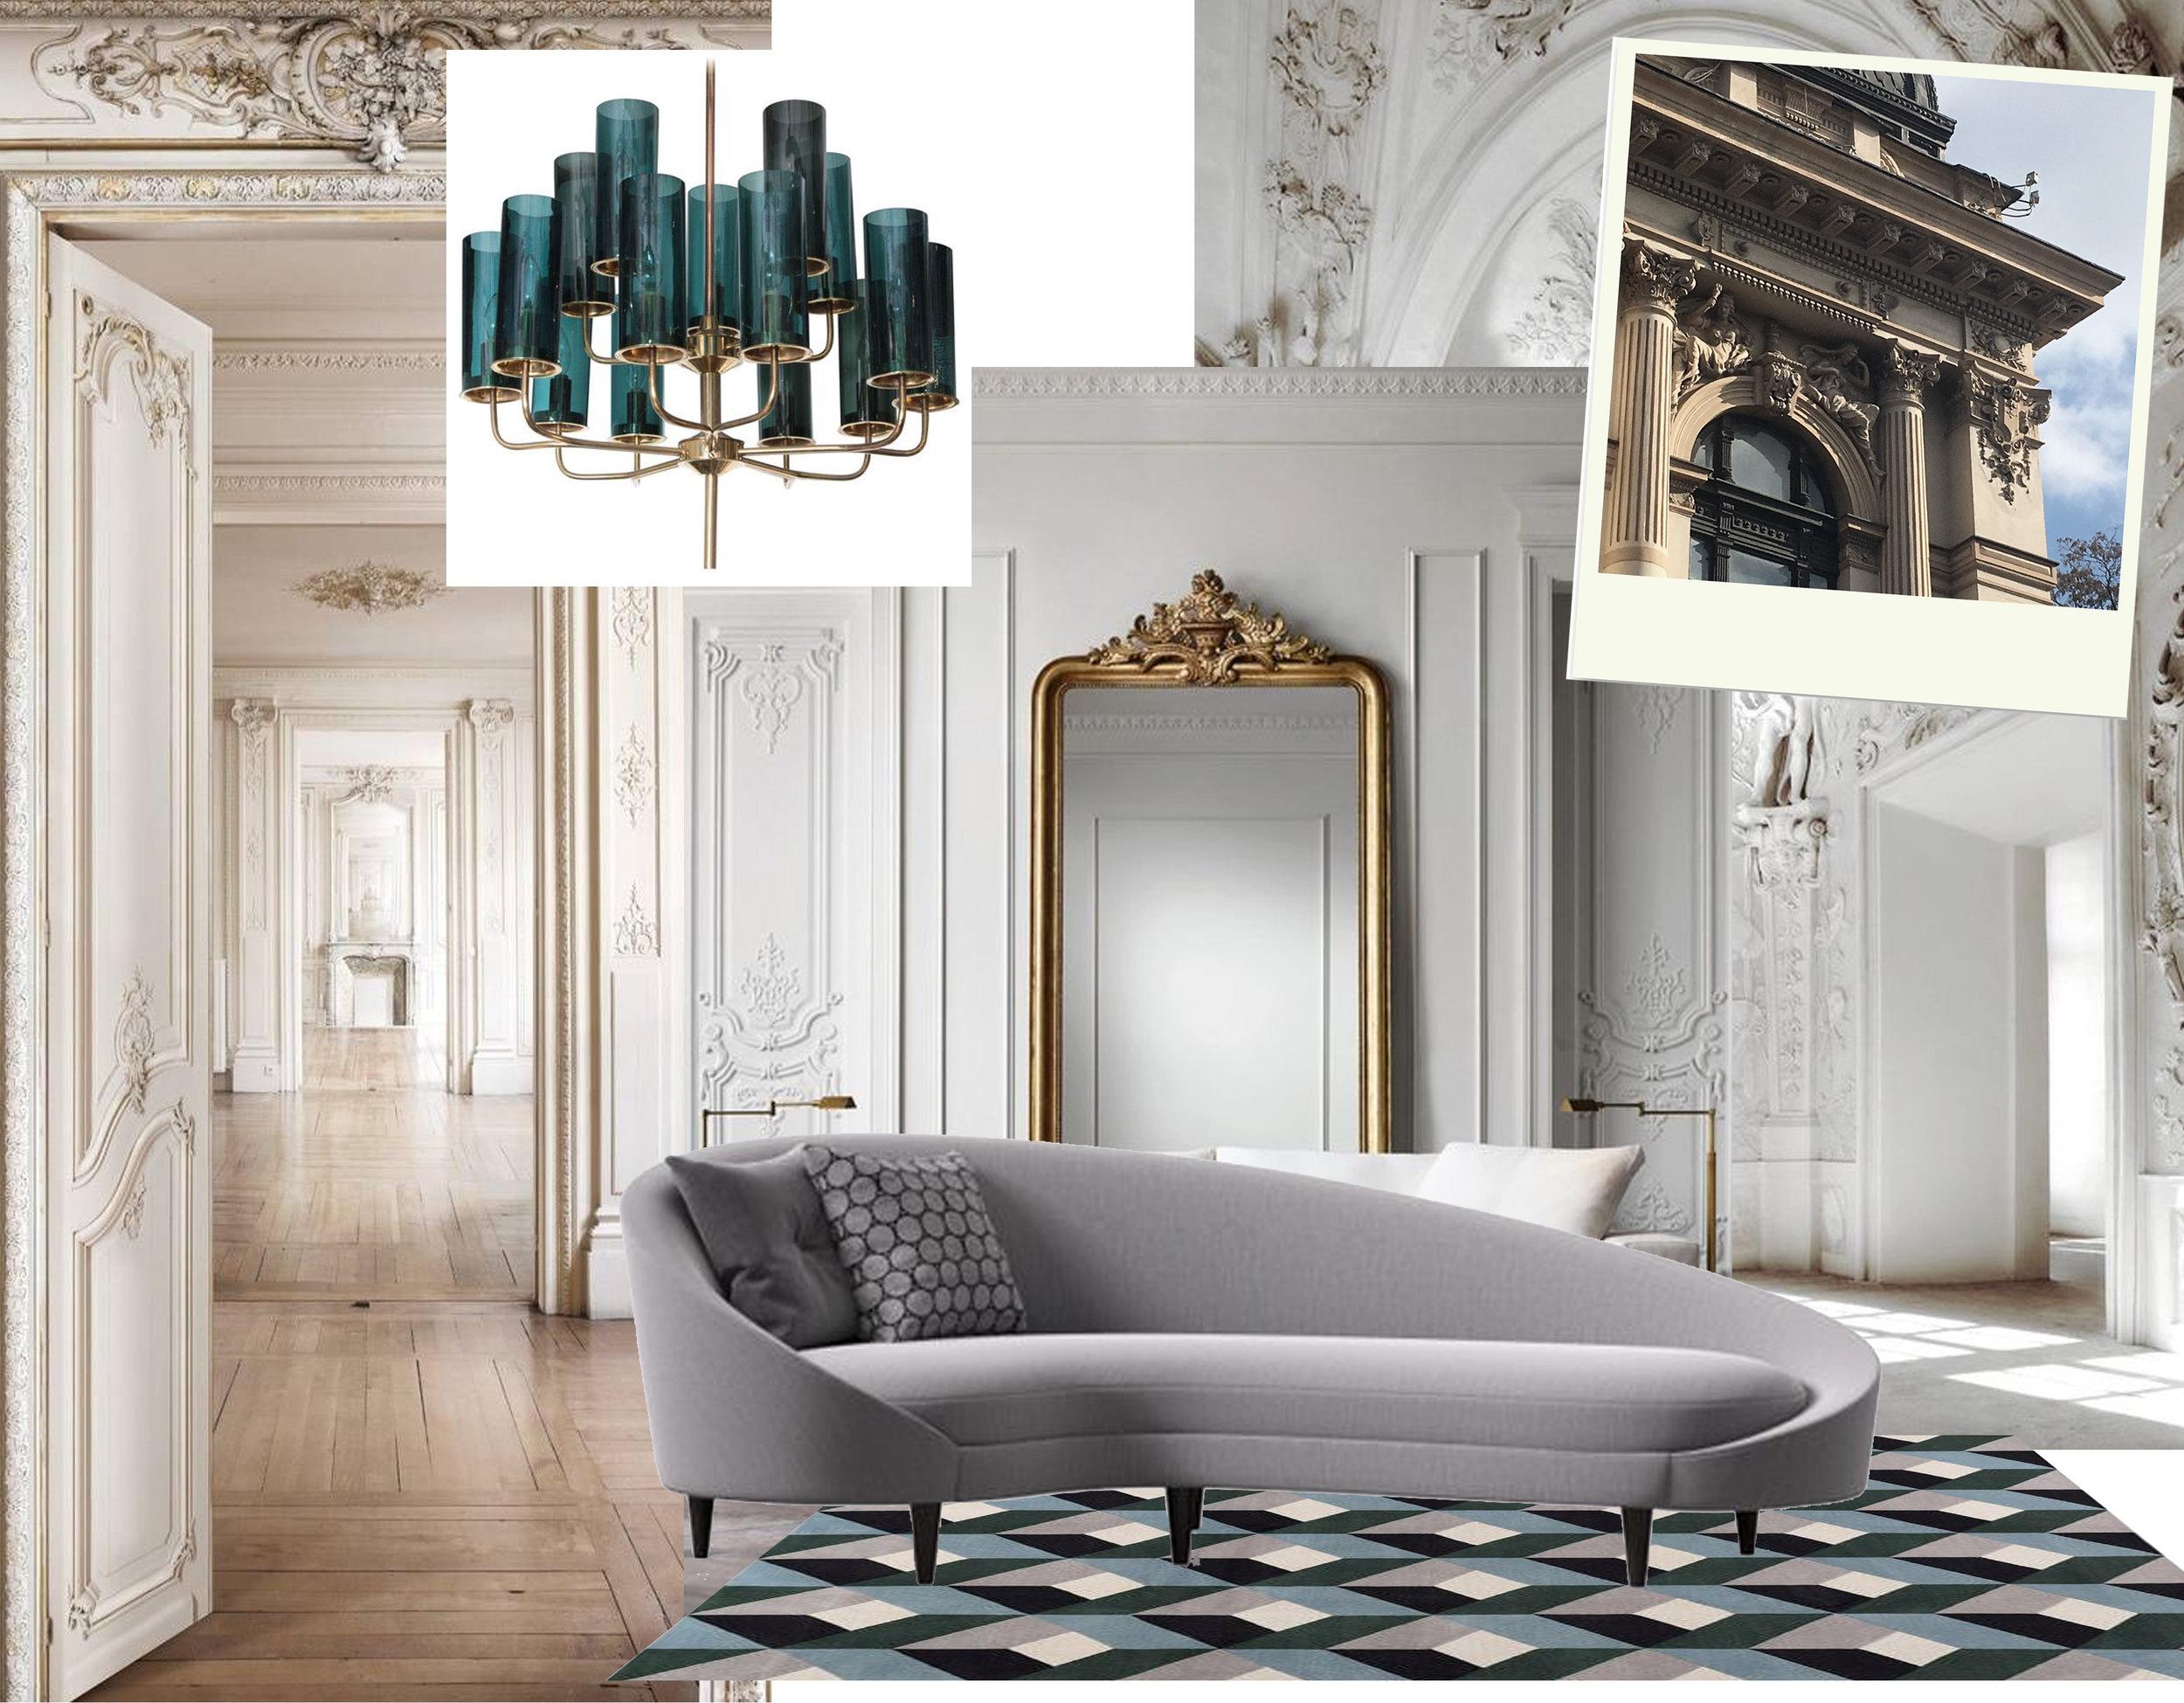 Brass and blue glass Tube Chandelier of Hans Agne Jakobsson via  1stdibs  - Bonavita rug  The Rugcompany - Parisian apartment via  Flickr  -